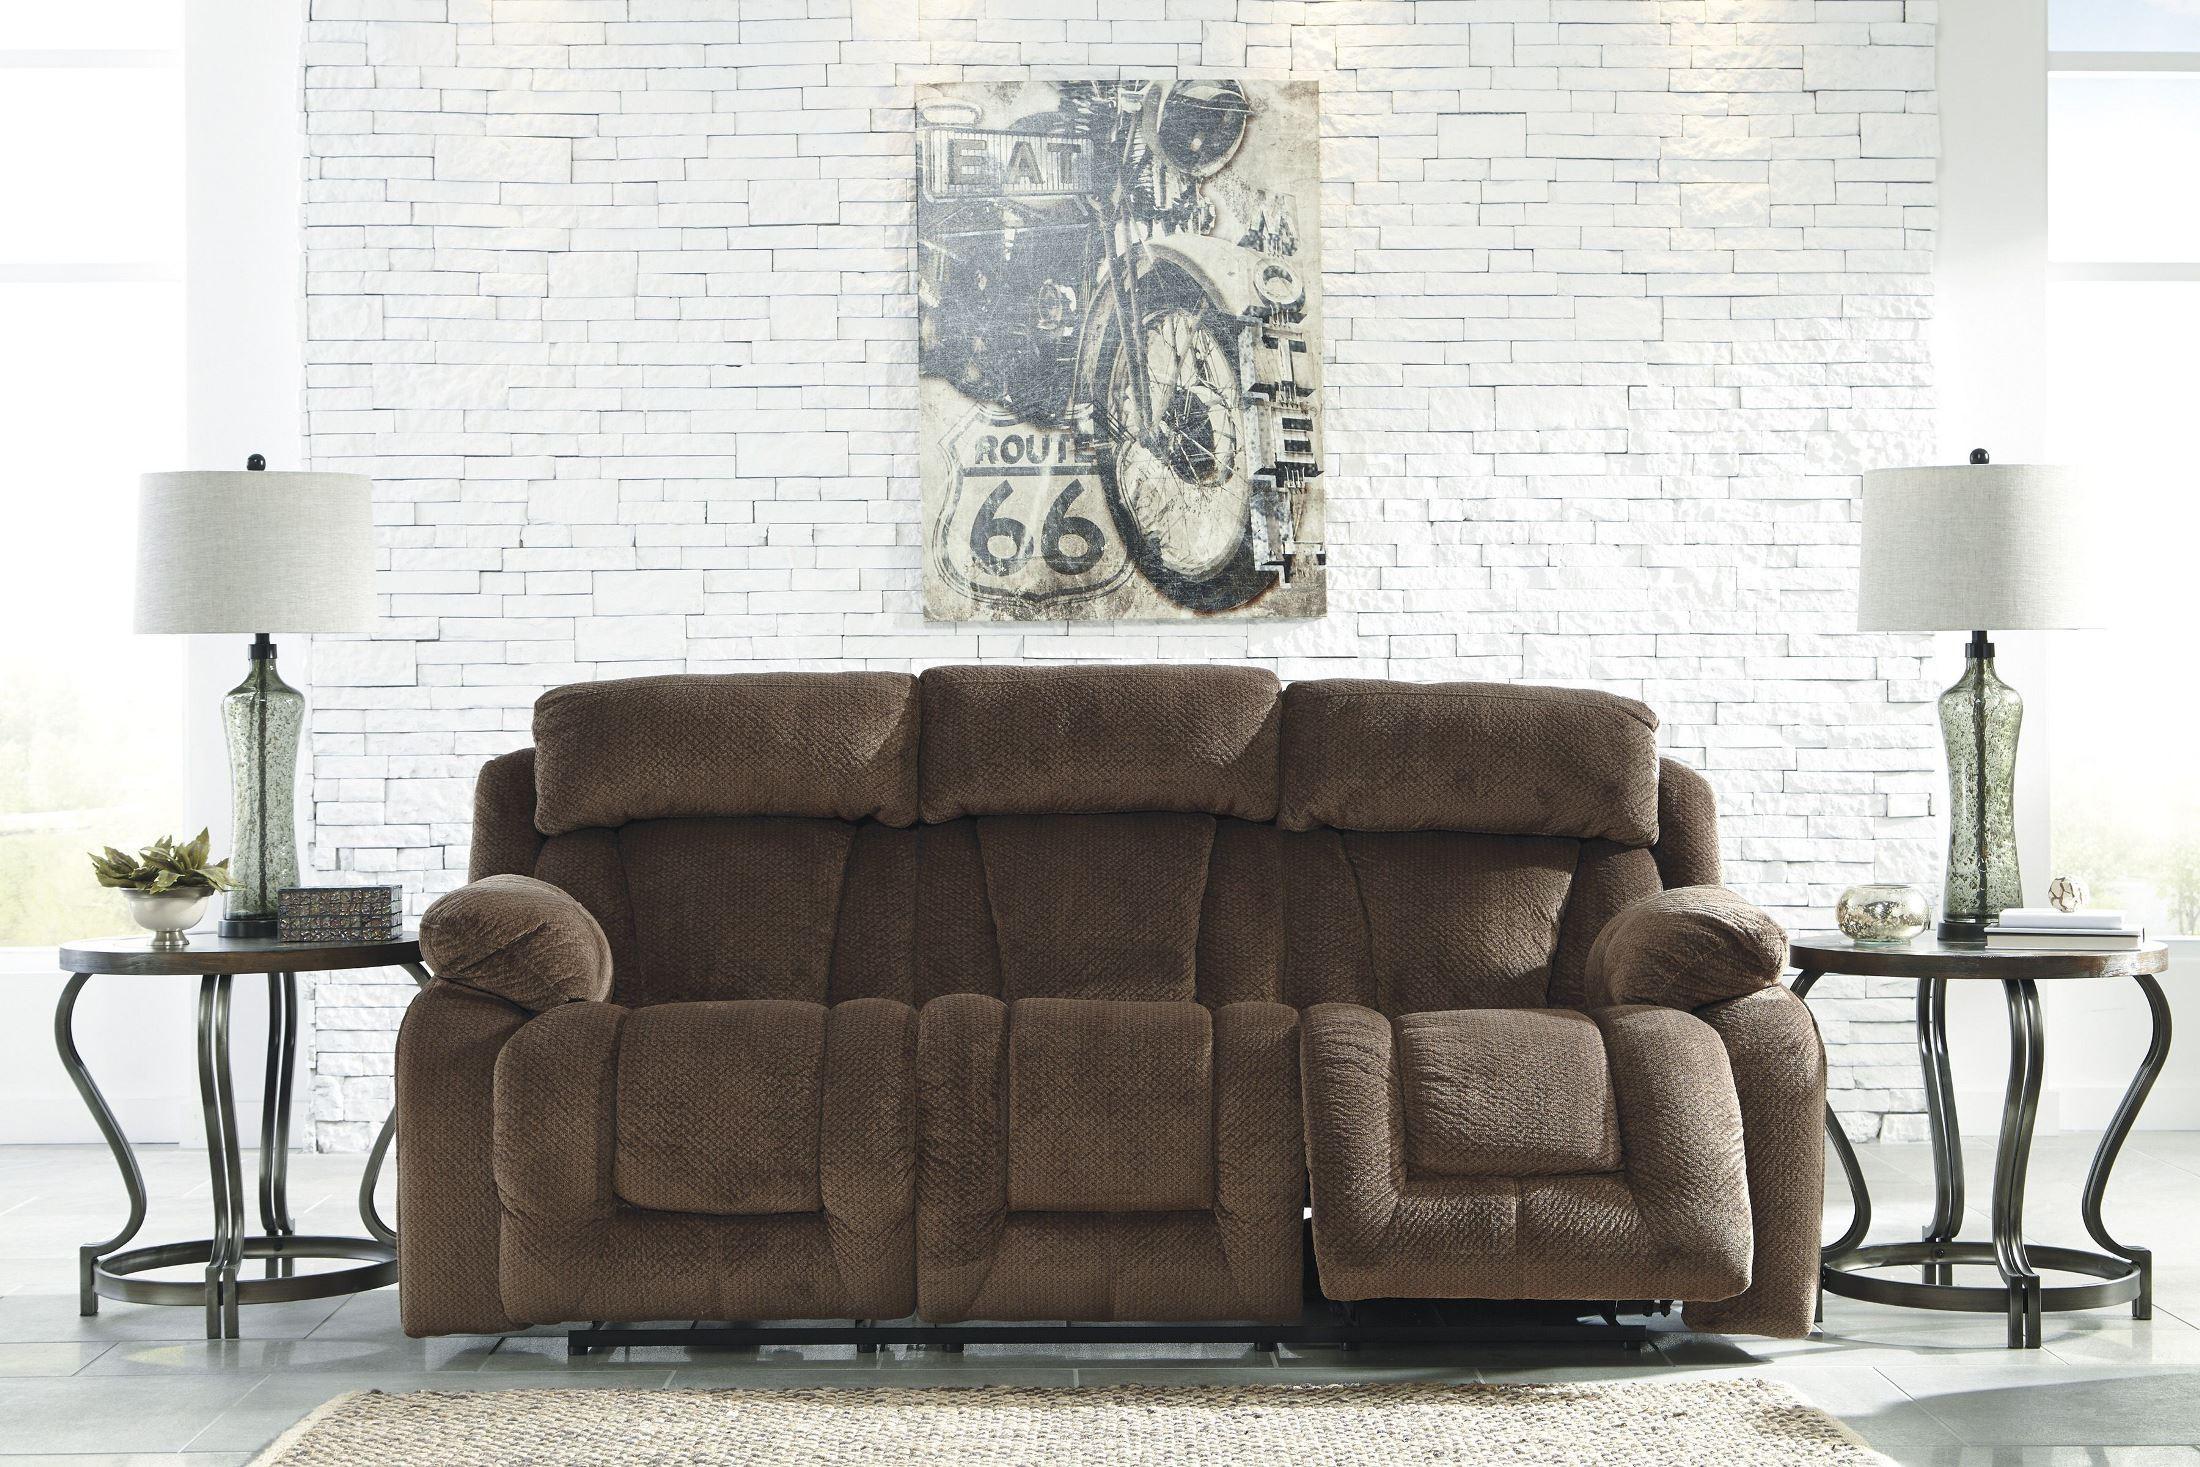 Stricklin Brown Power Reclining Sofa From Ashley 8650387